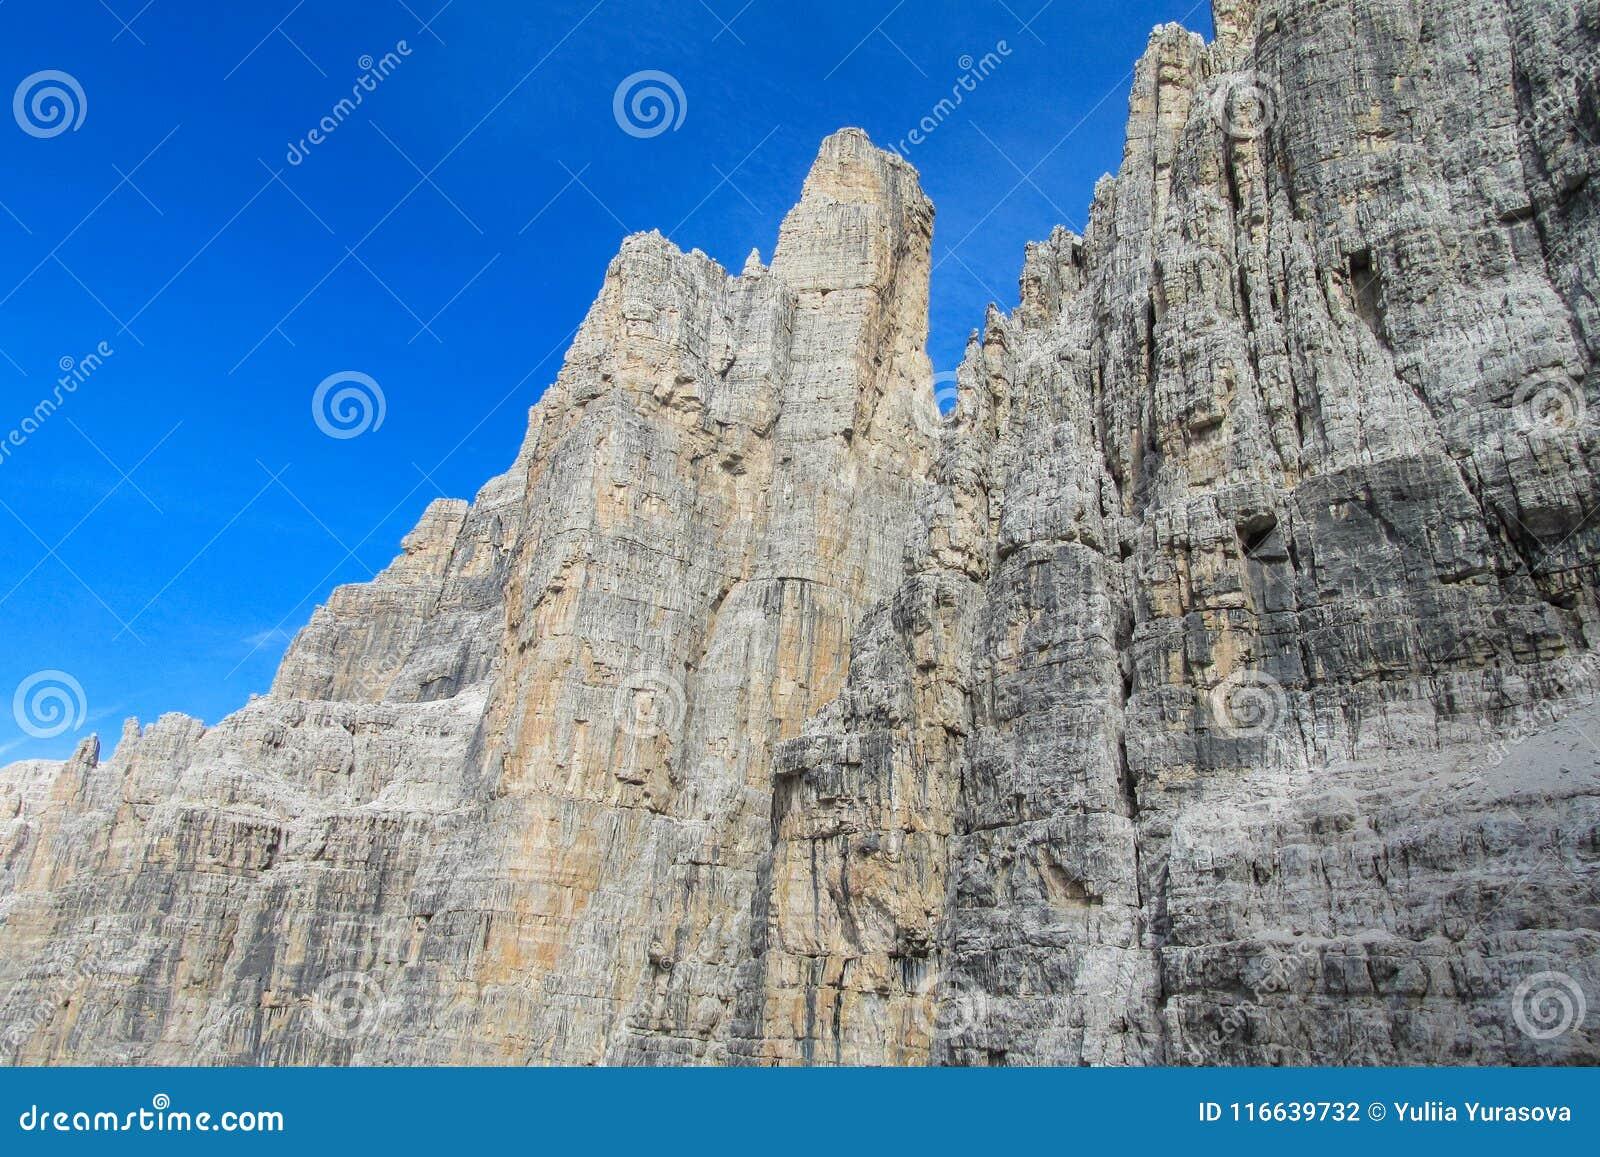 Beautiful rocky mountain wall Dolomiti di Brenta, Italy